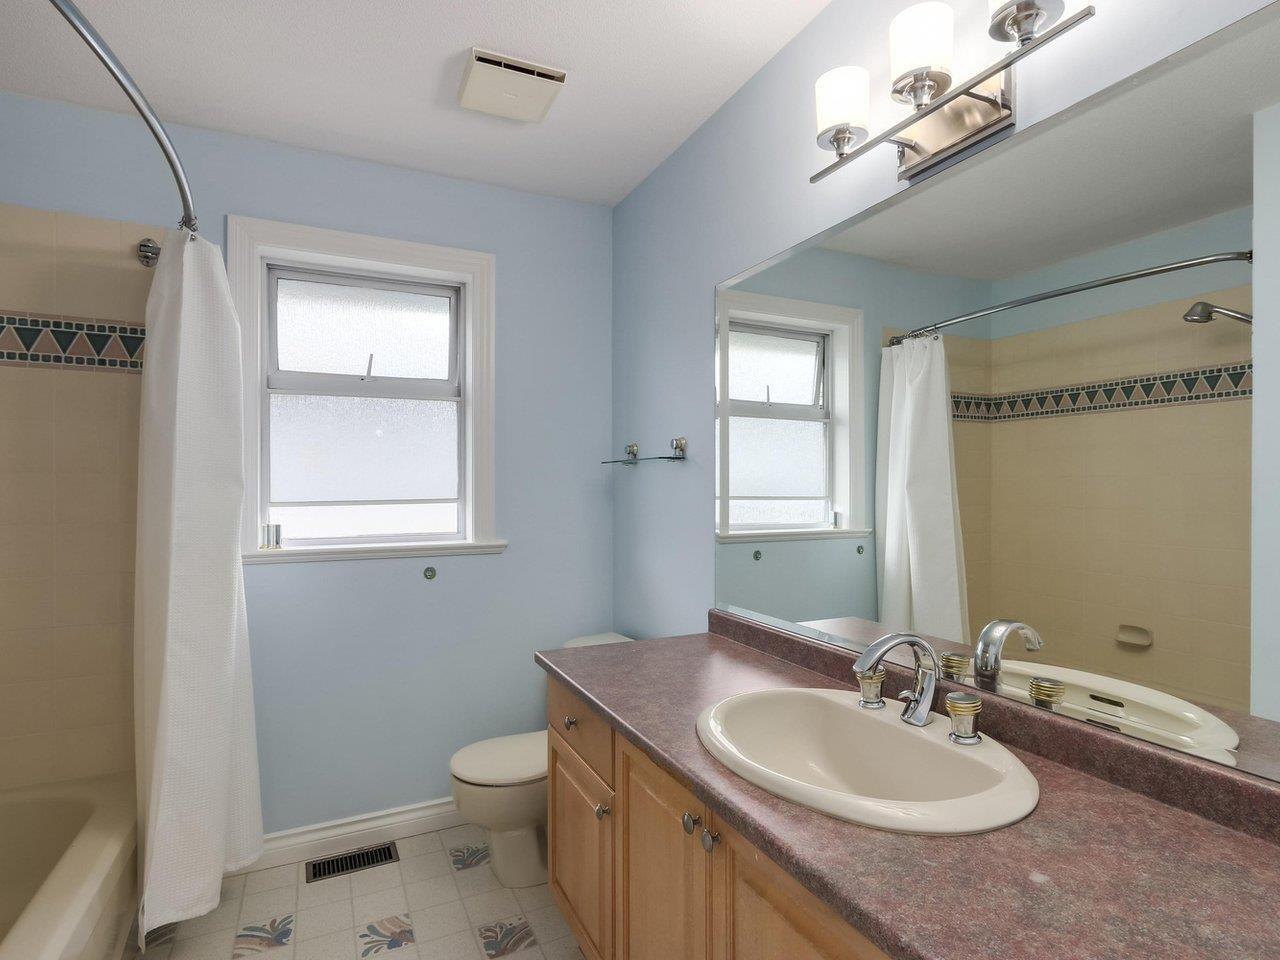 Photo 17: Photos: 12548 25A Avenue in Surrey: Crescent Bch Ocean Pk. House for sale (South Surrey White Rock)  : MLS®# R2328780